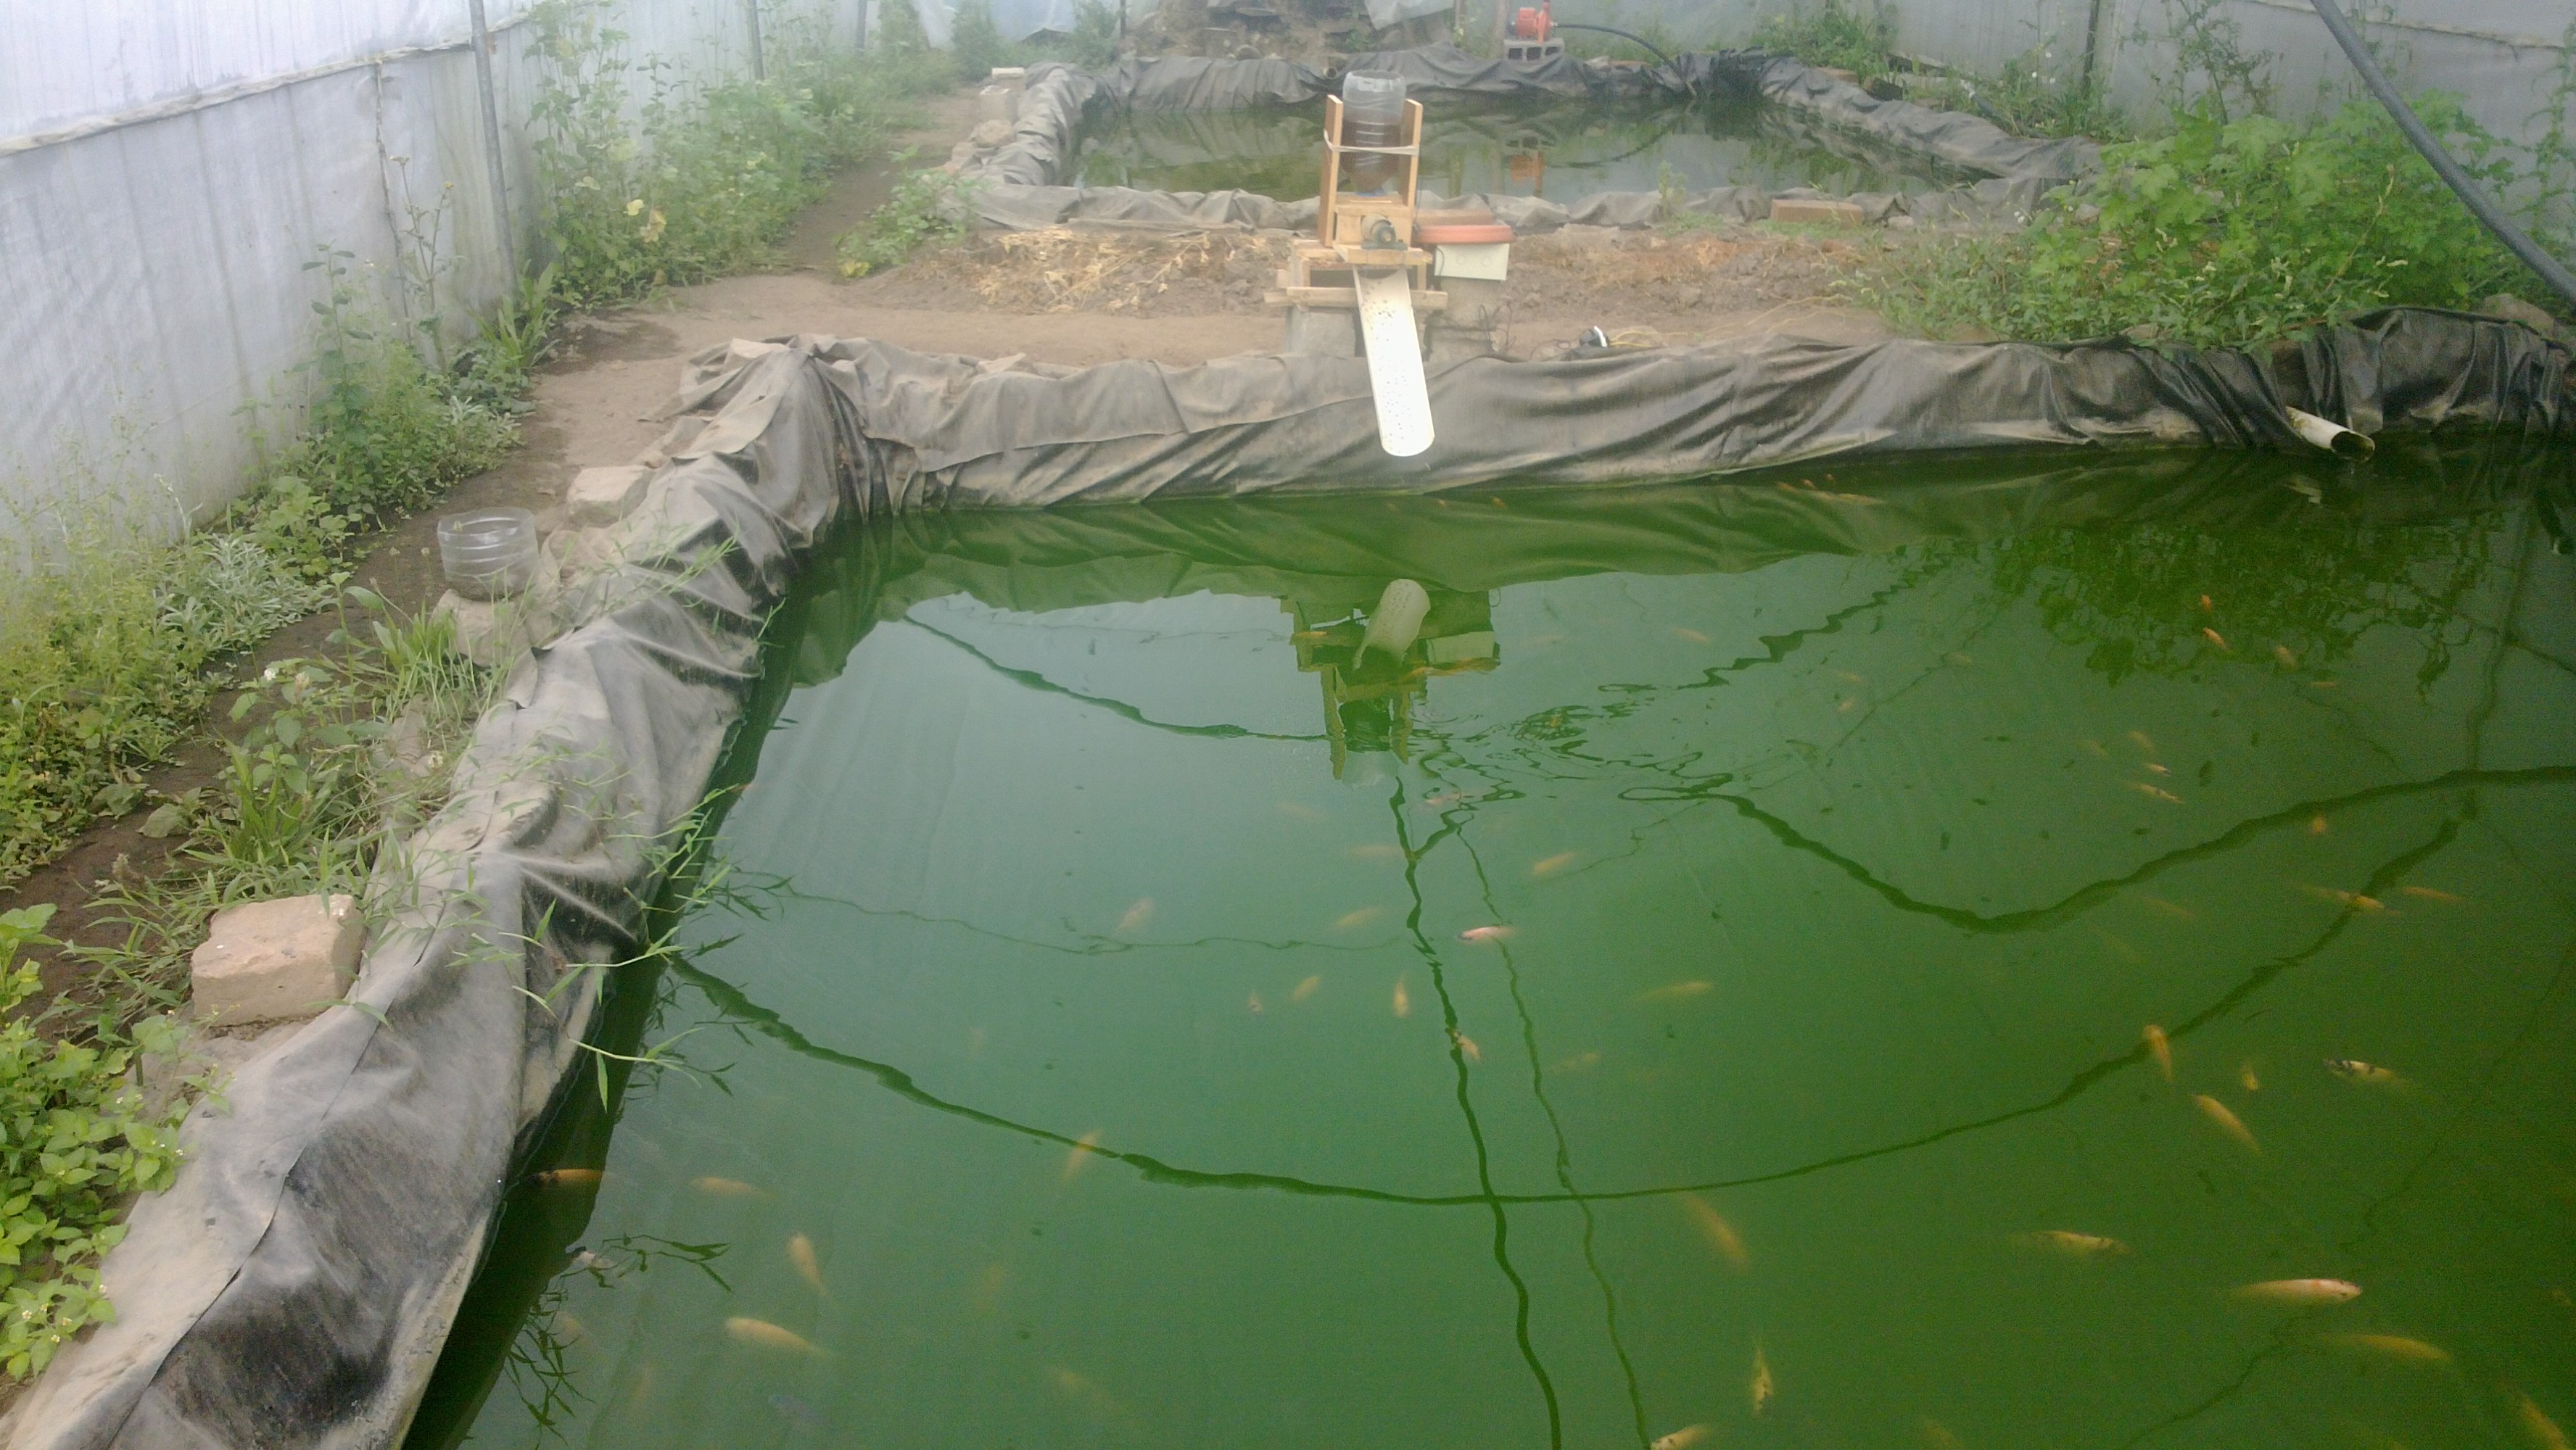 Watching soluciones tecnol gicas ecuador quito for Comida peces estanque barata